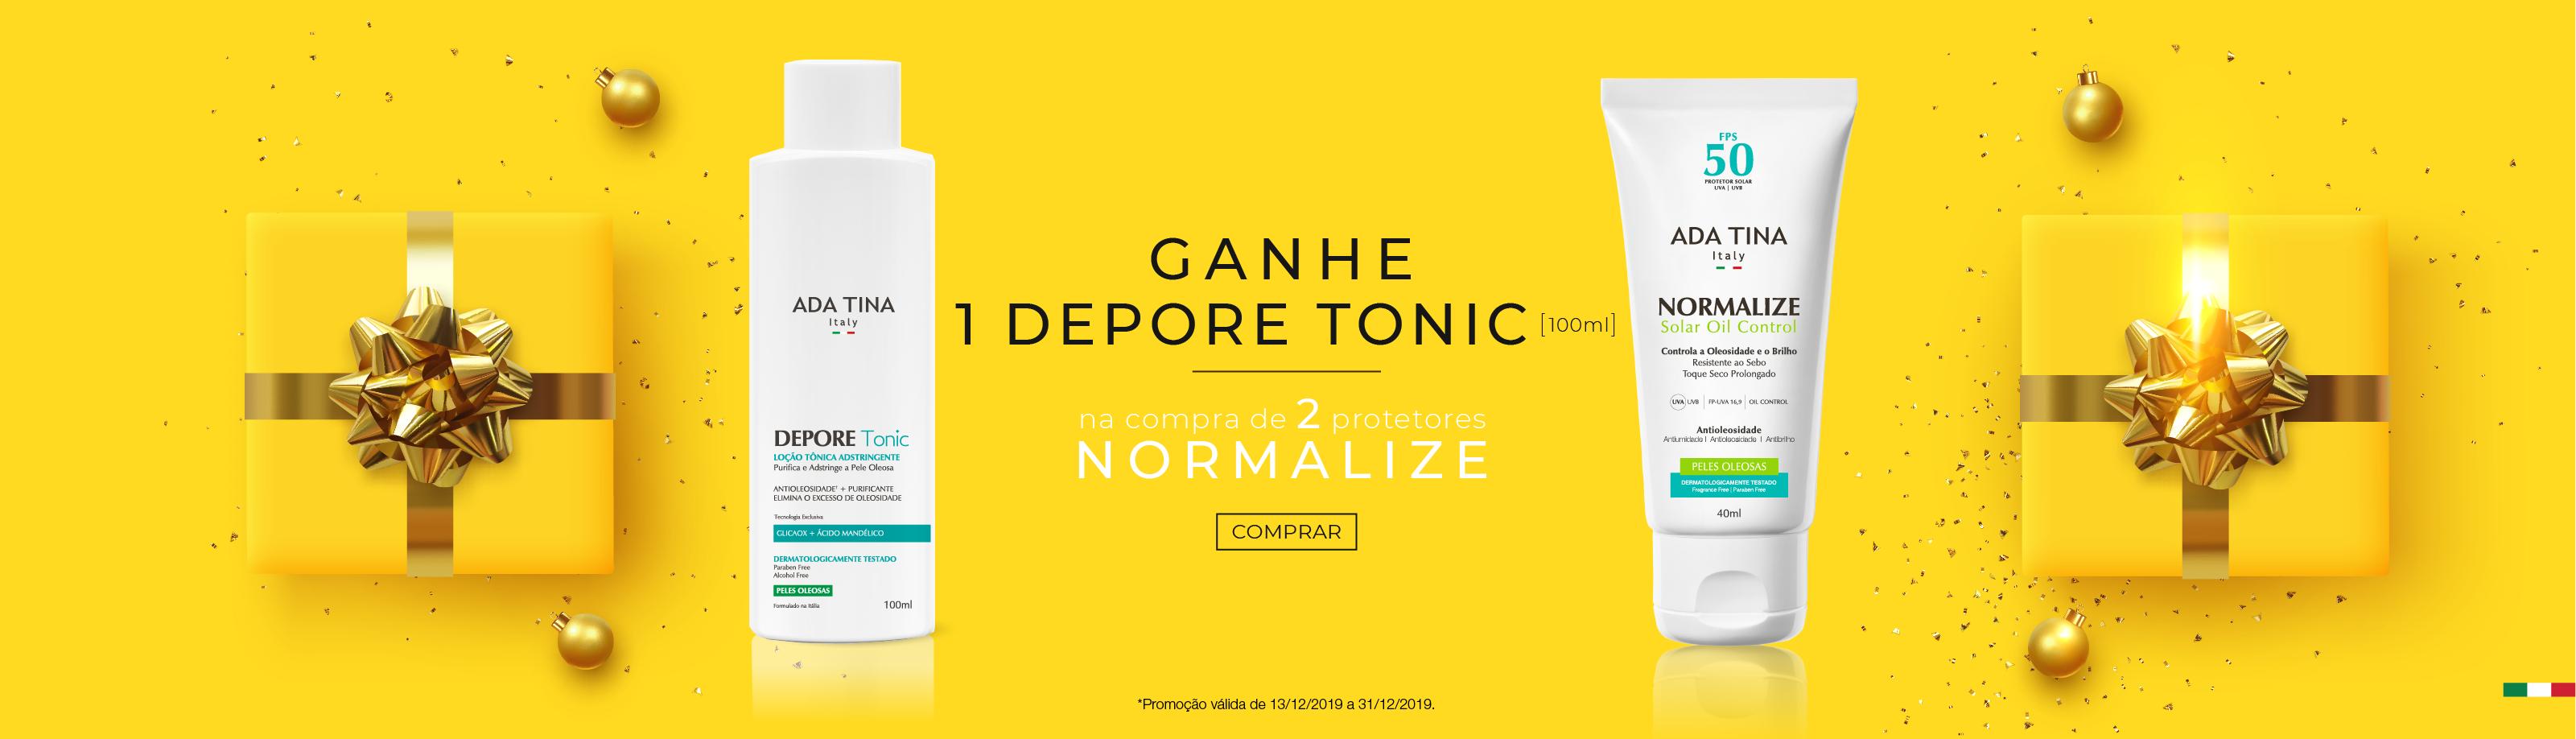 MOBILE GANHE DEPORE TONIC 100ML